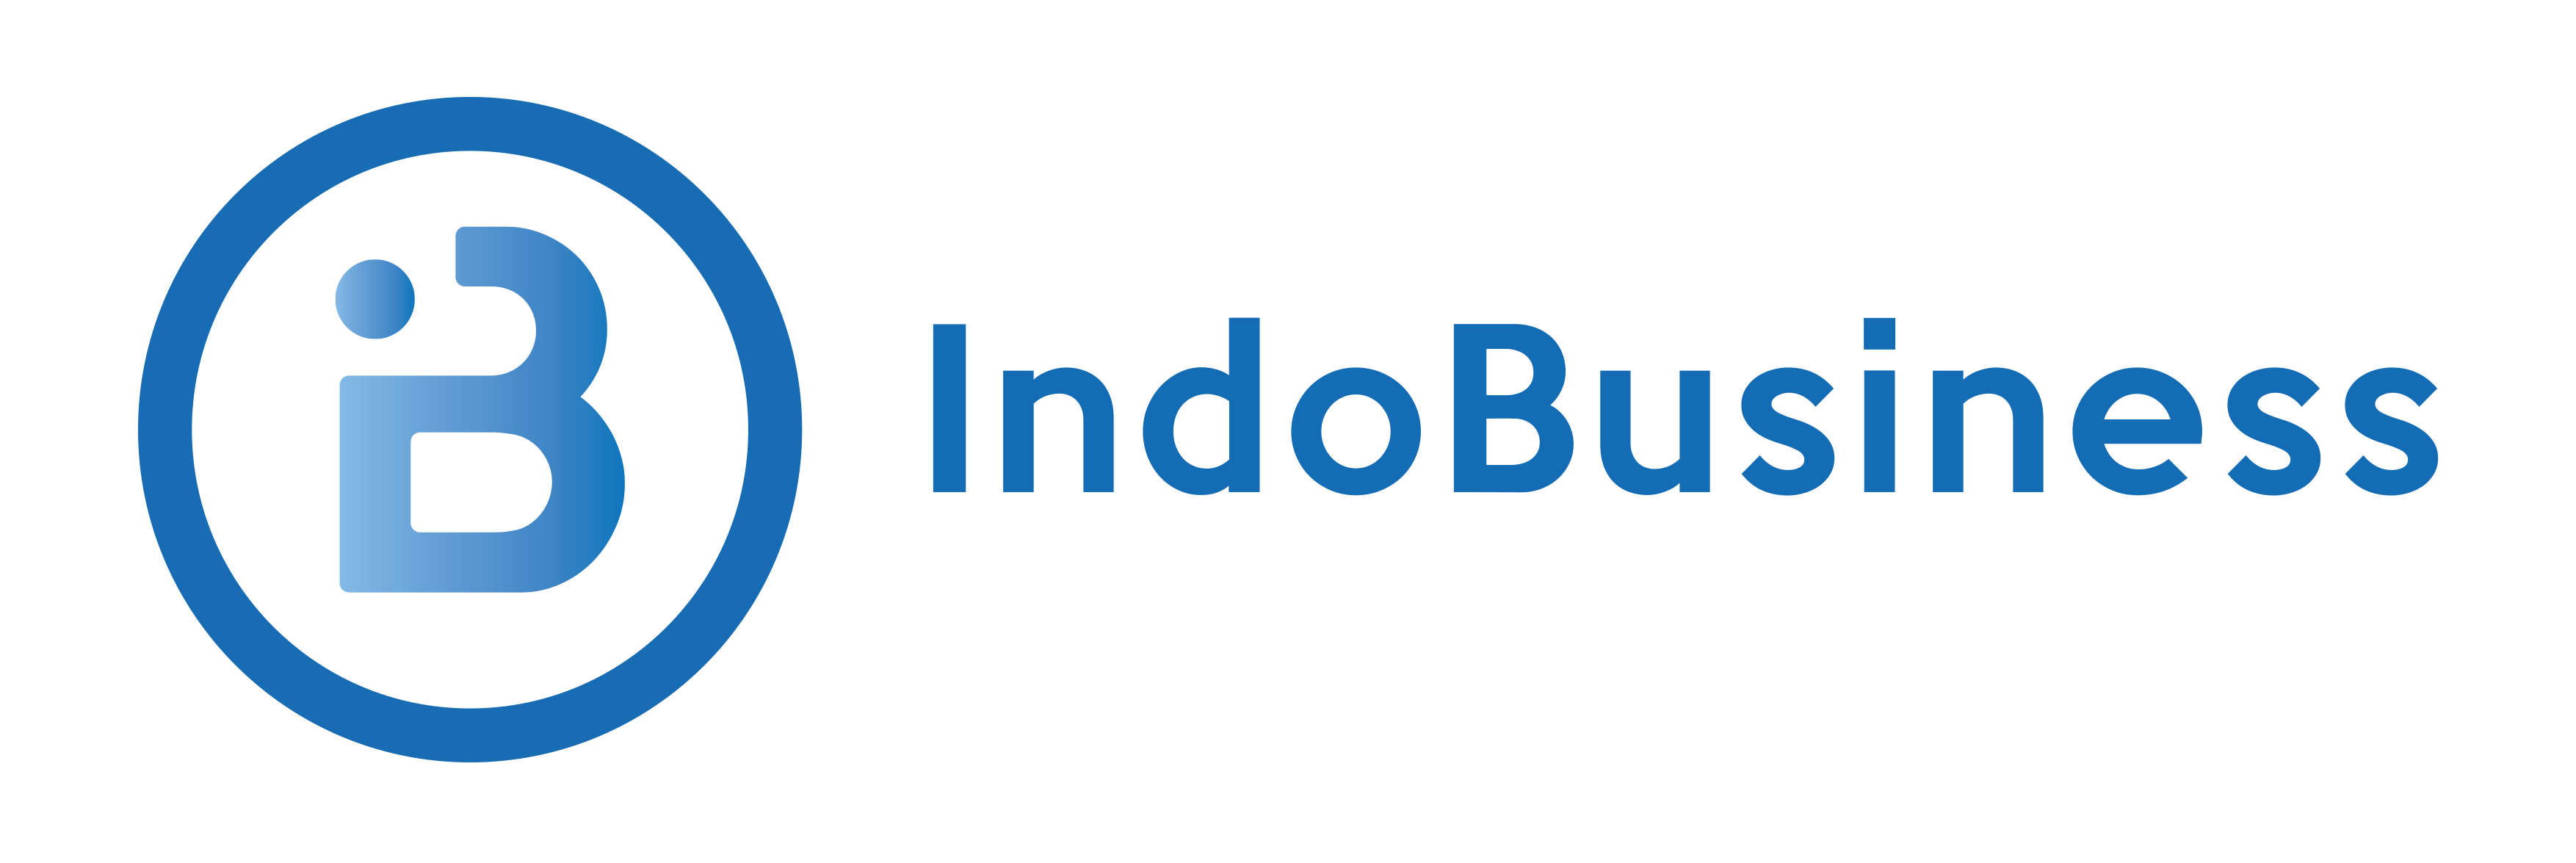 IndoBusiness